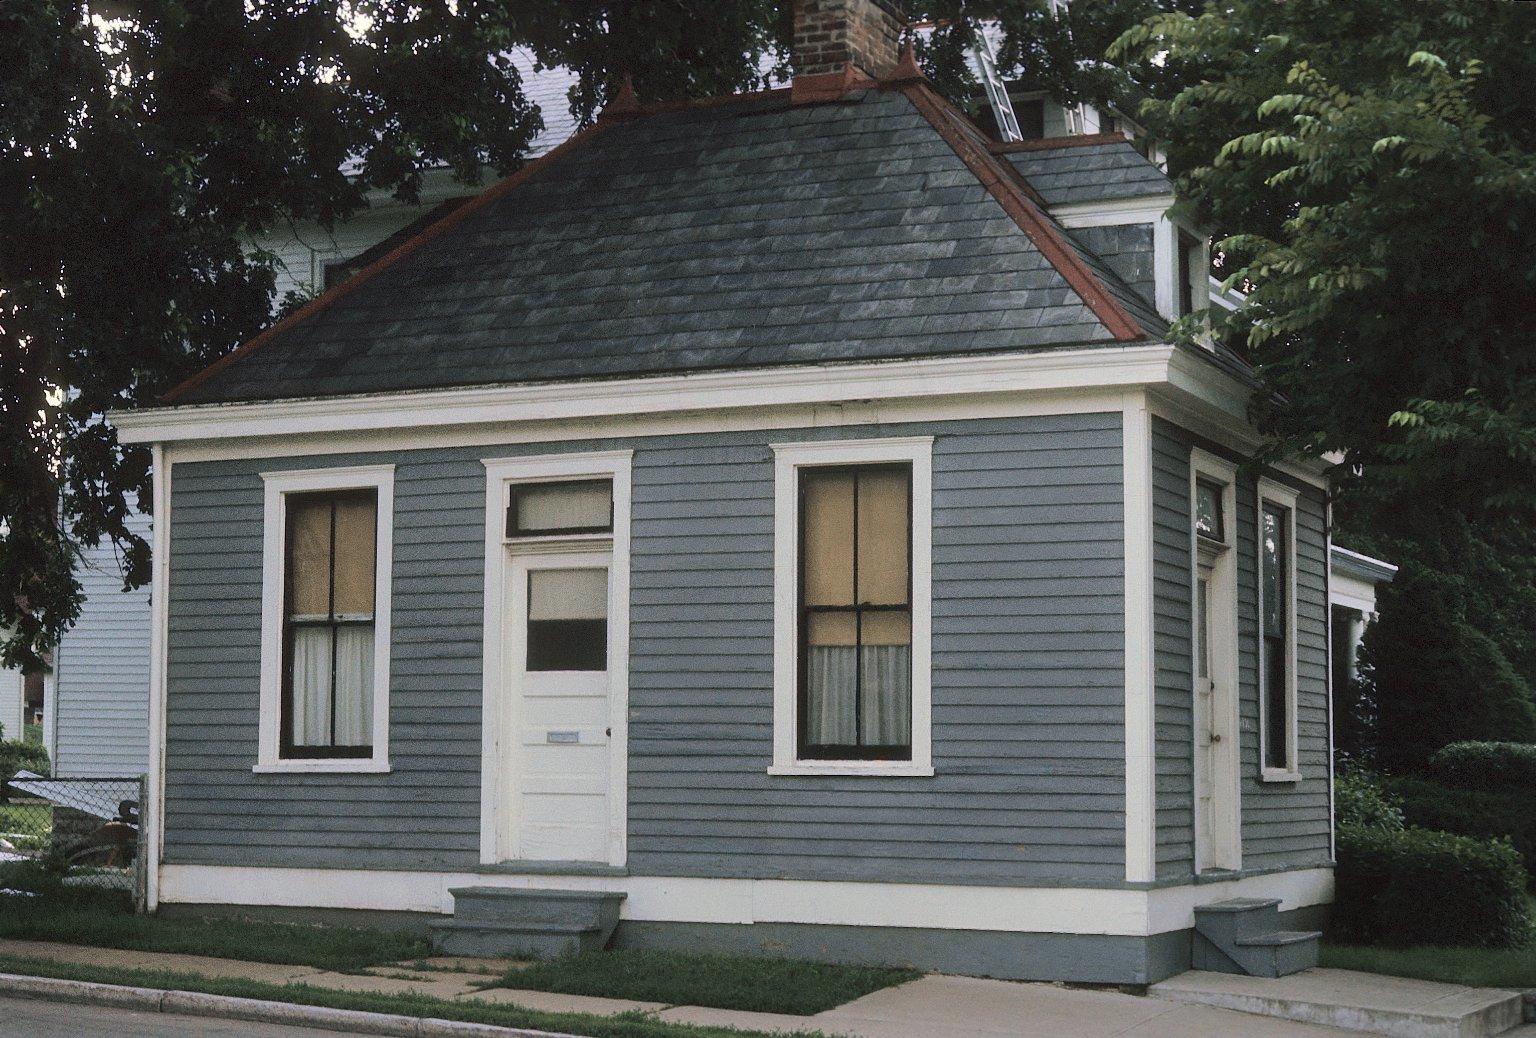 Hoffner Historic District